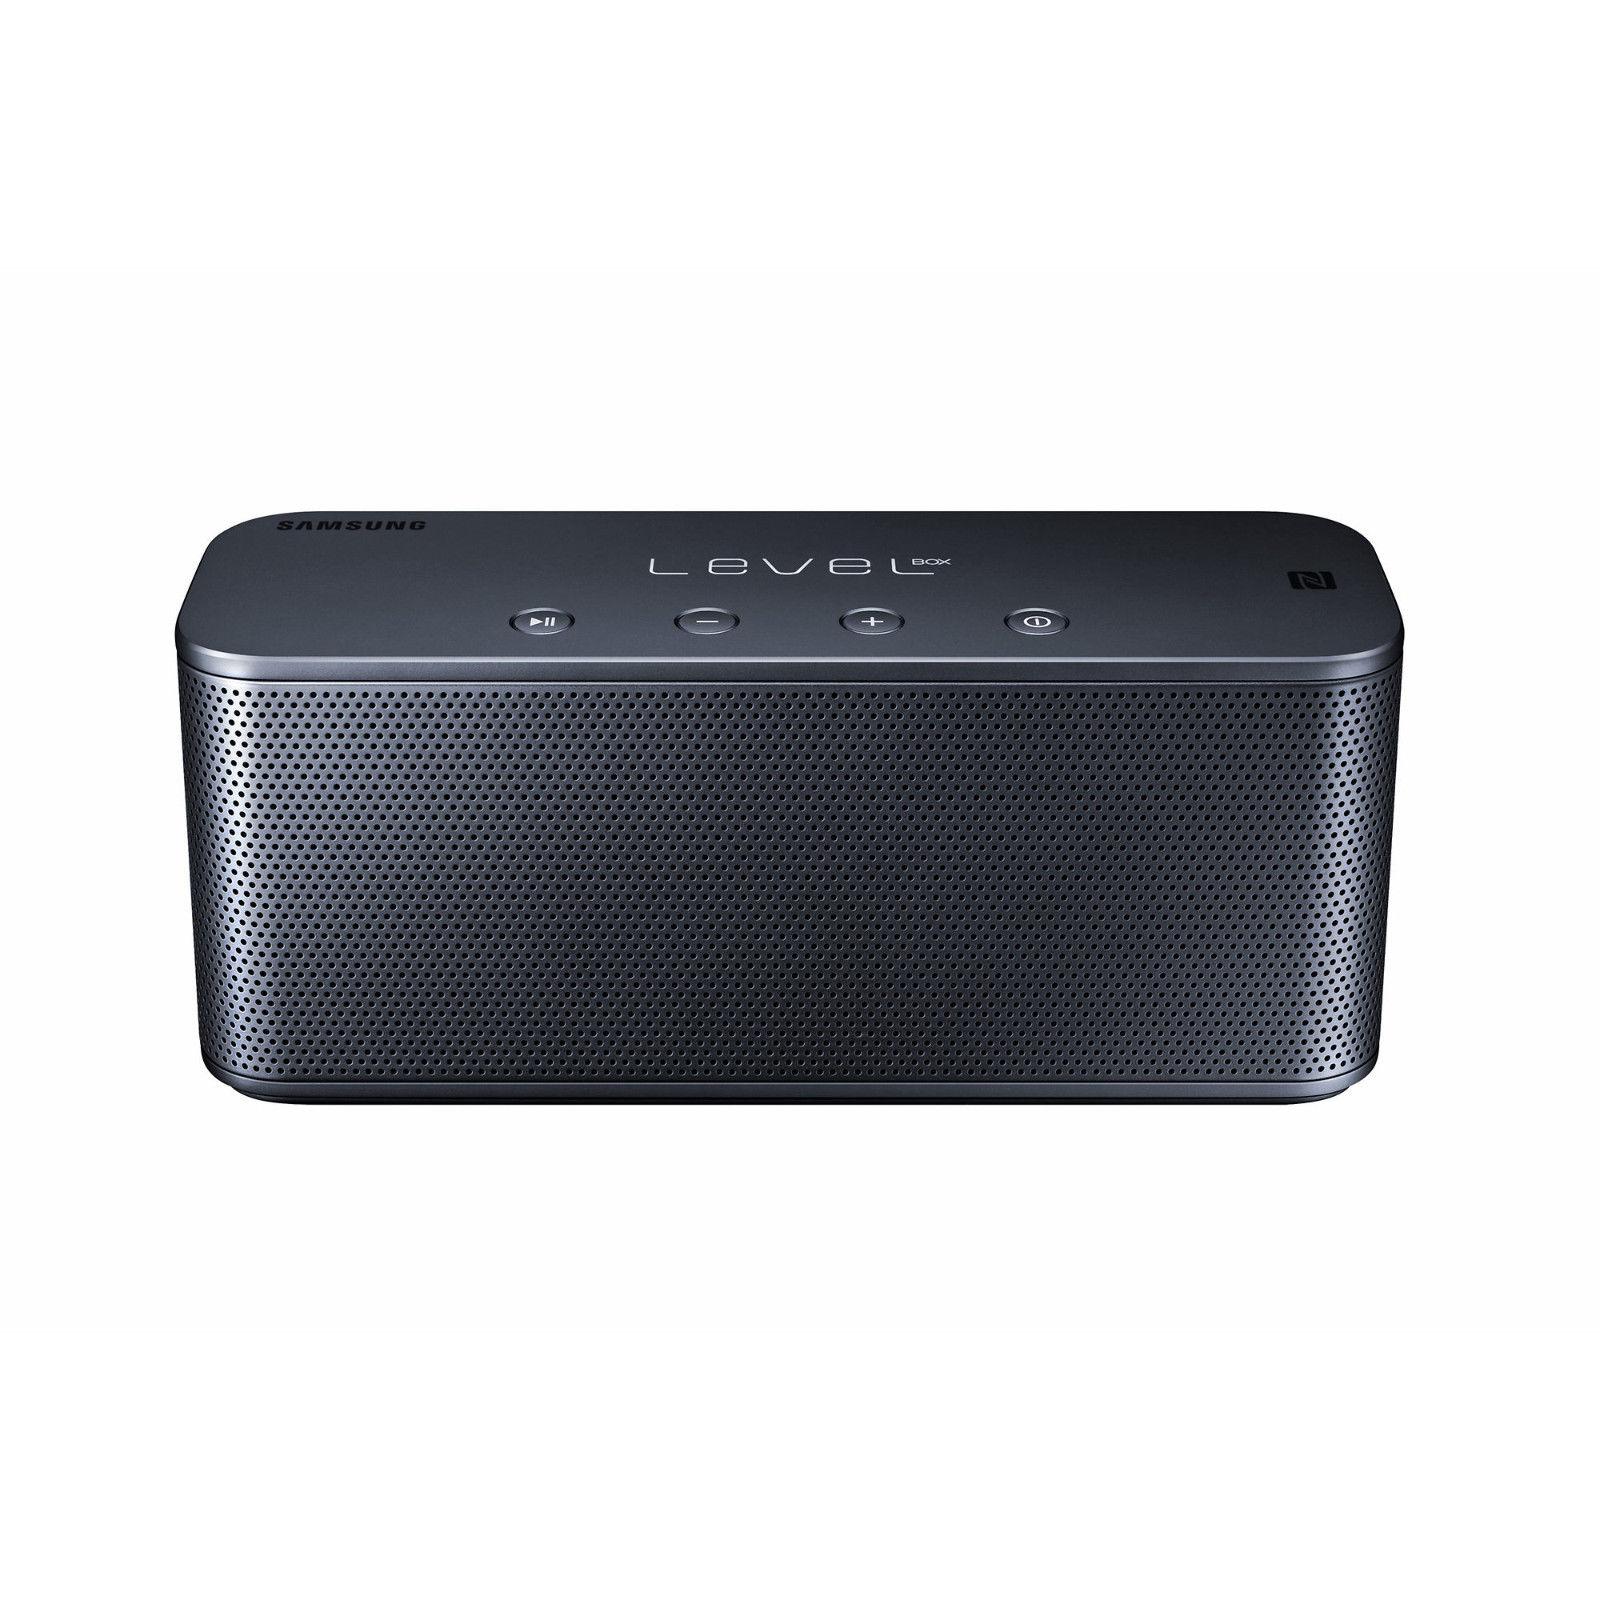 Samsung EQ-SG900DBEST1 Level Box Mini Bluetooth(R) Speaker, Black